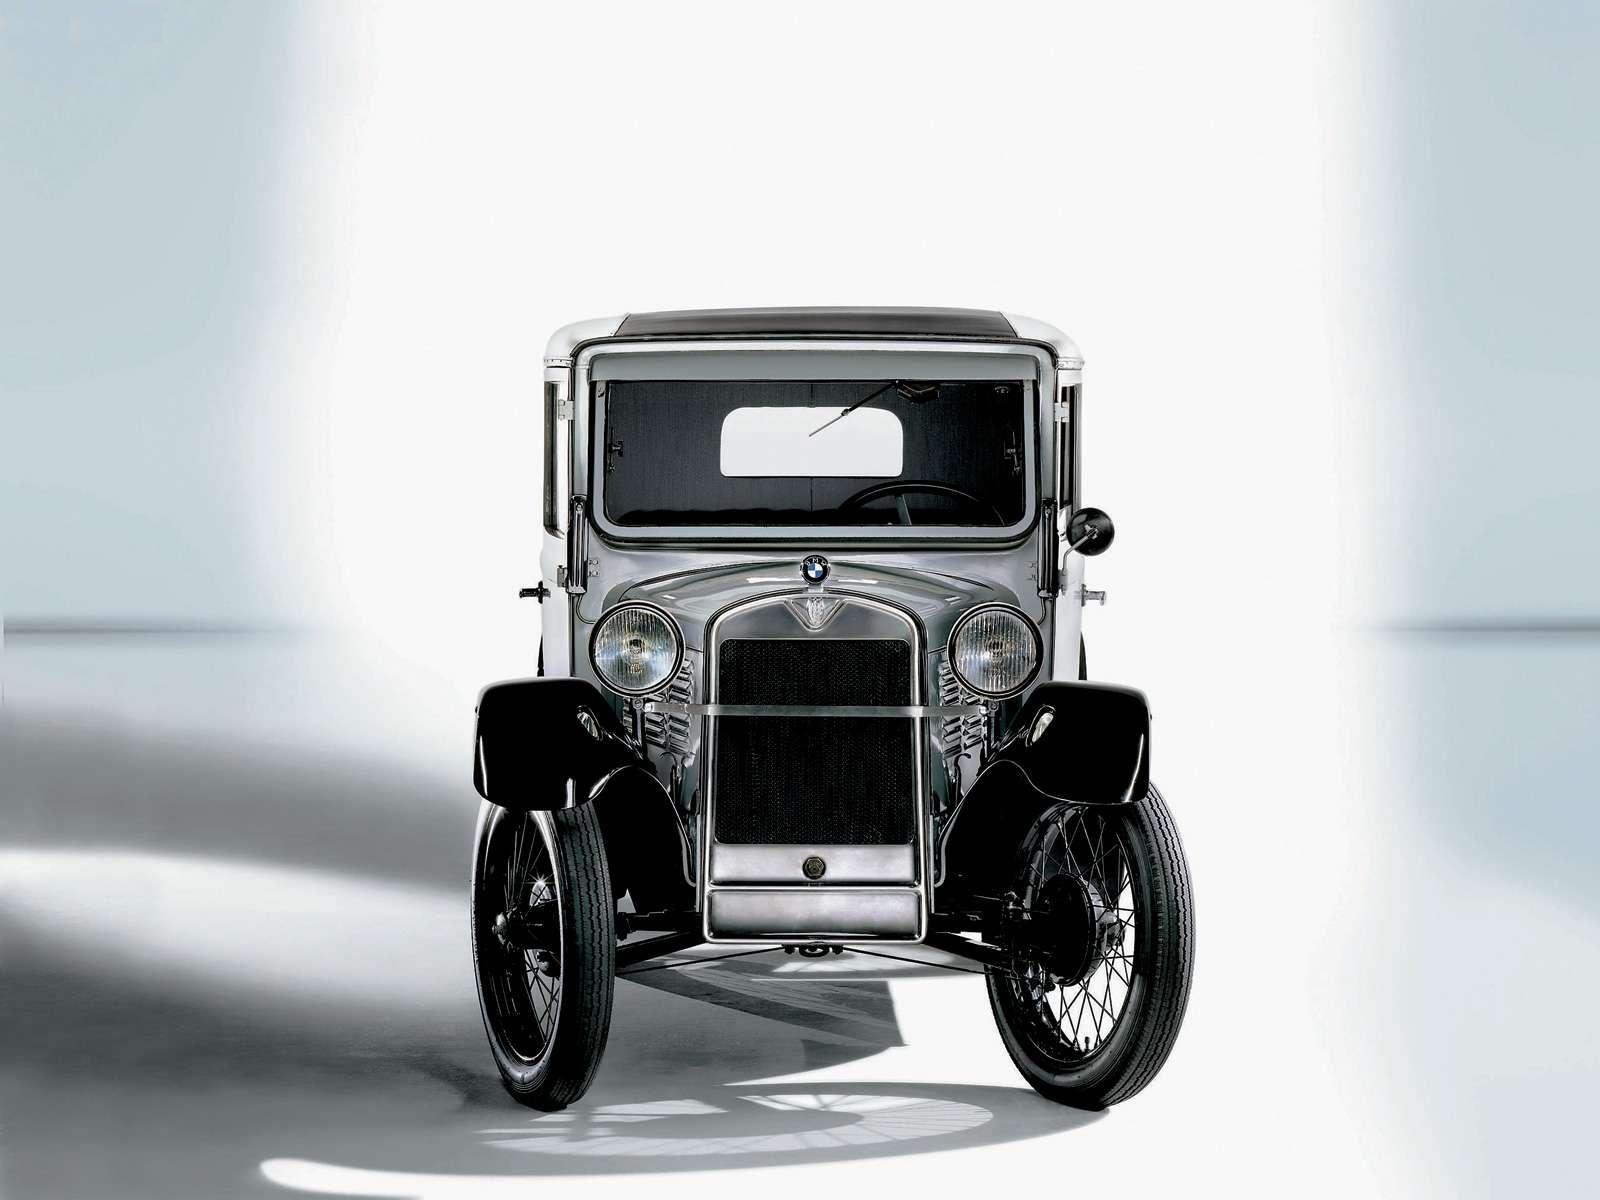 BMW DIXI - THE FIRST BMW CAR EVER MADE - 1600px Image #7